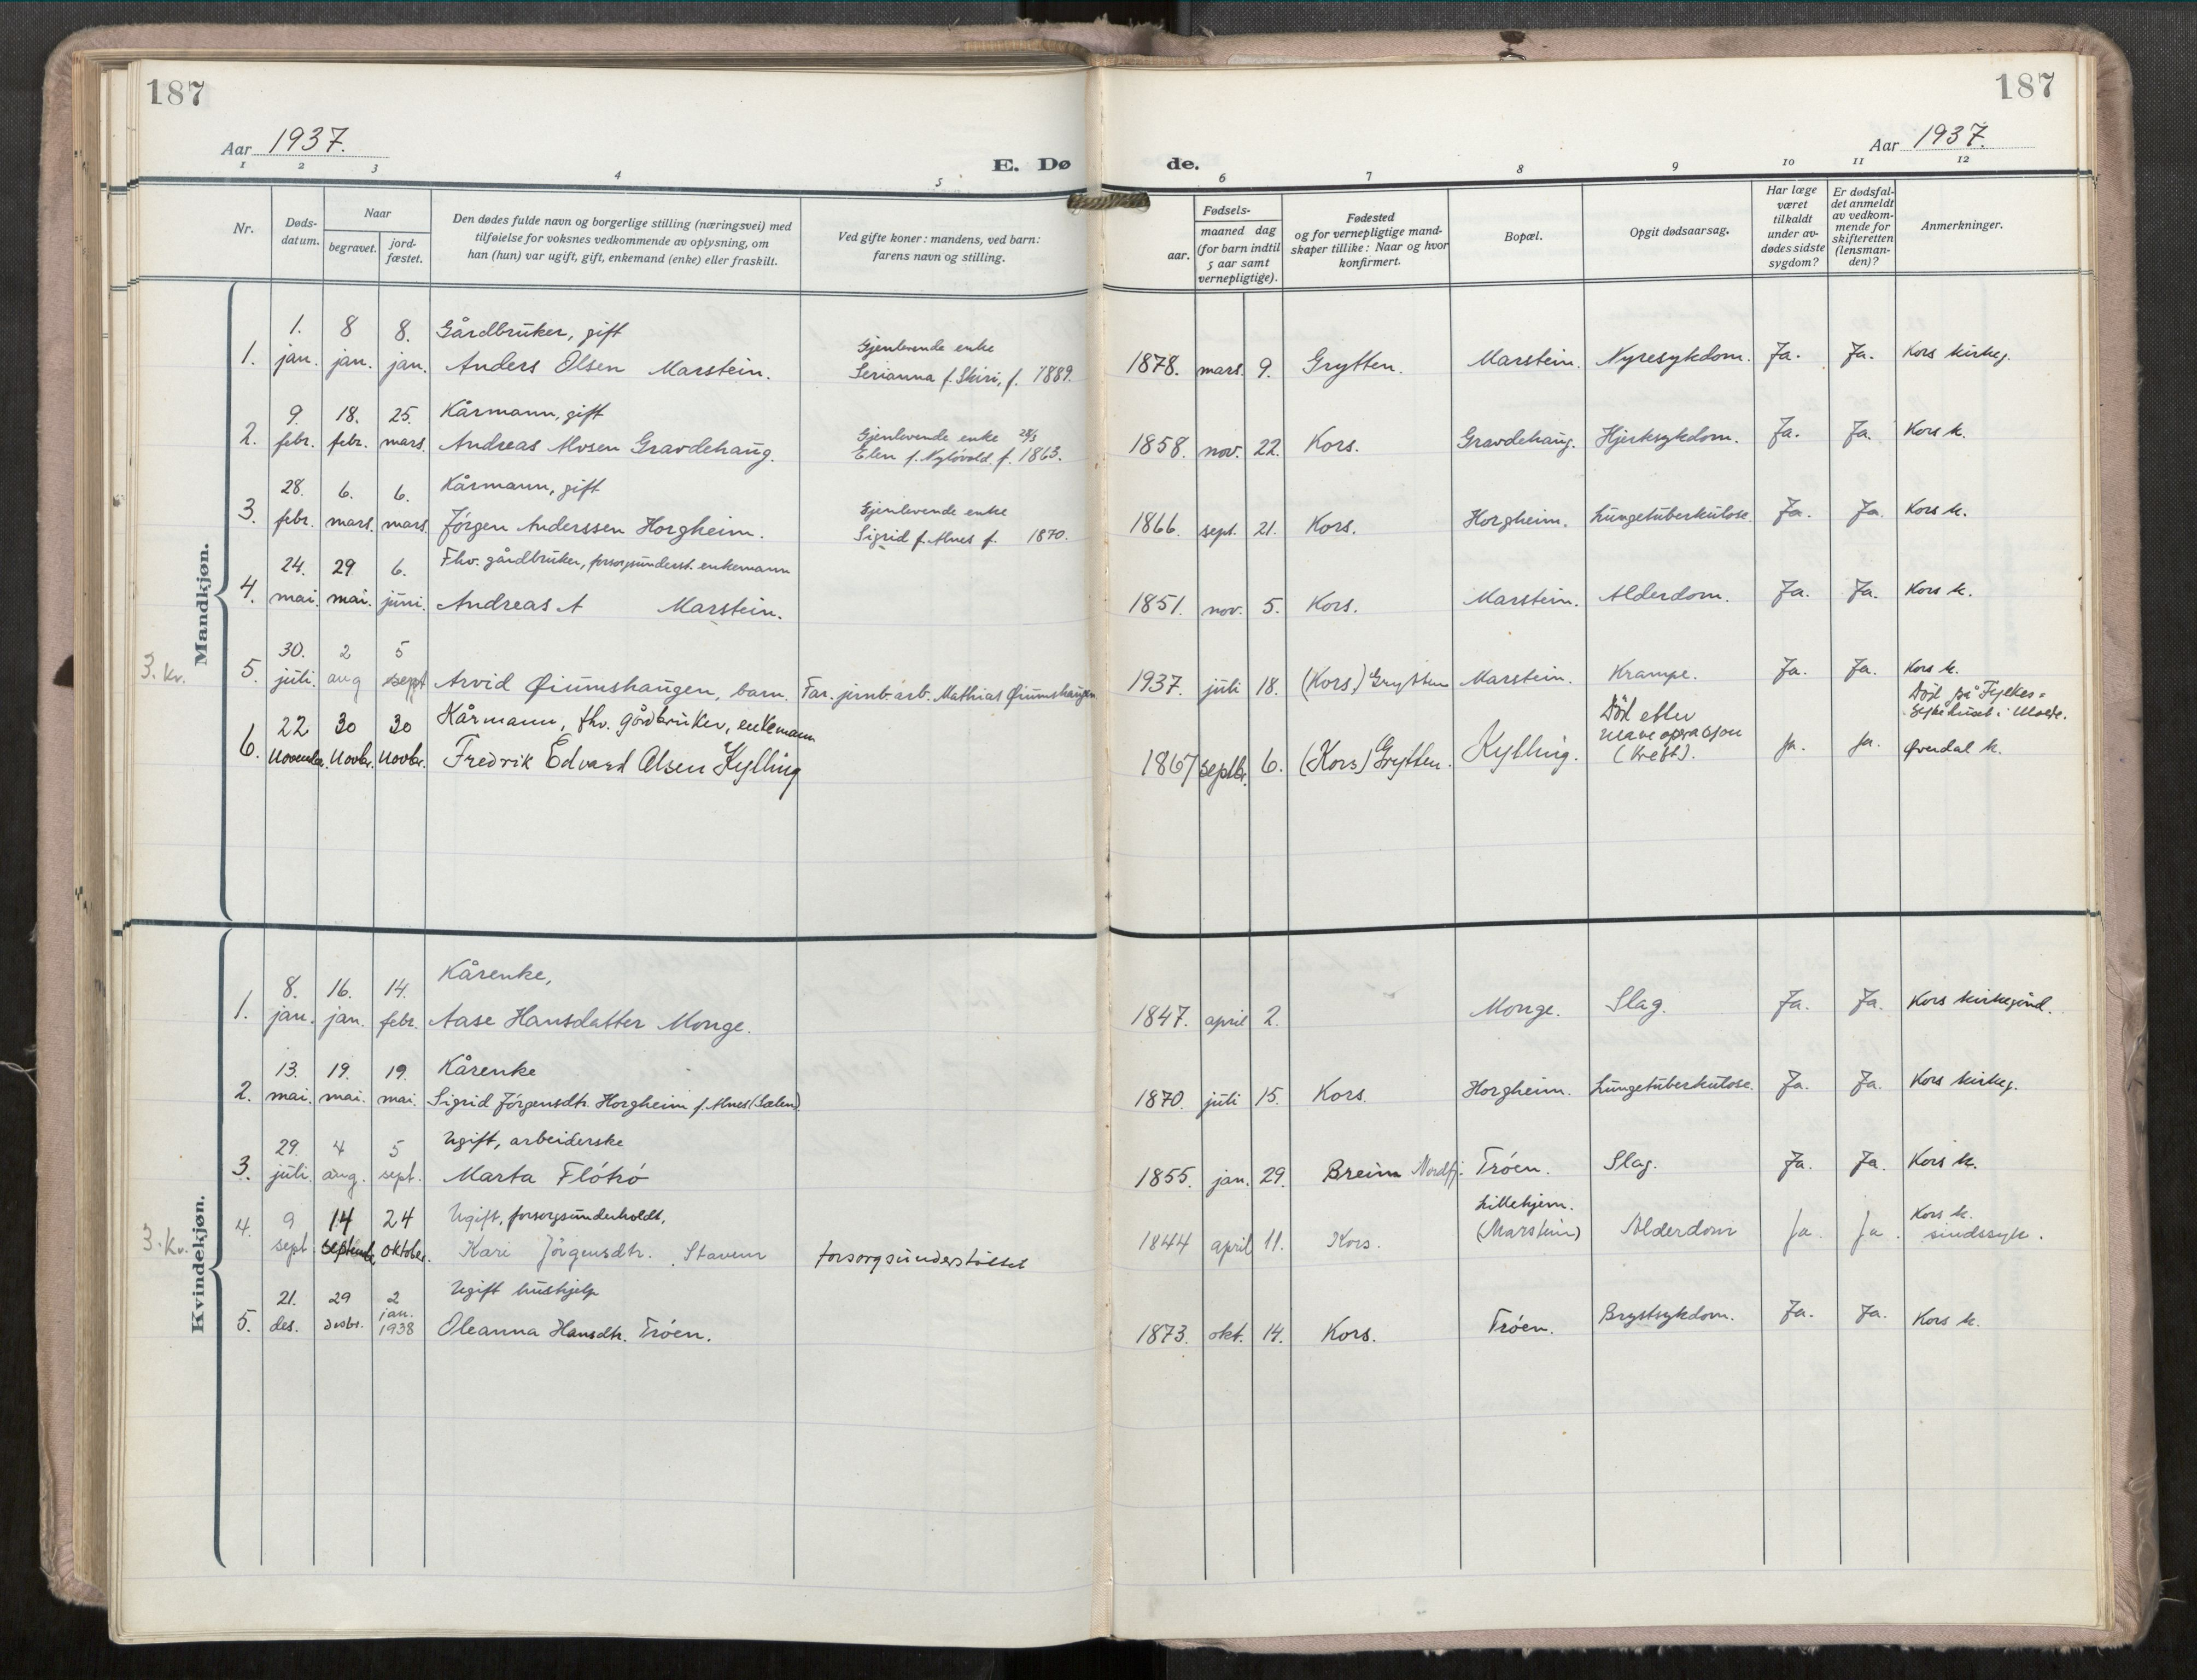 SAT, Grytten sokneprestkontor, Ministerialbok nr. 546A04, 1919-1956, s. 187